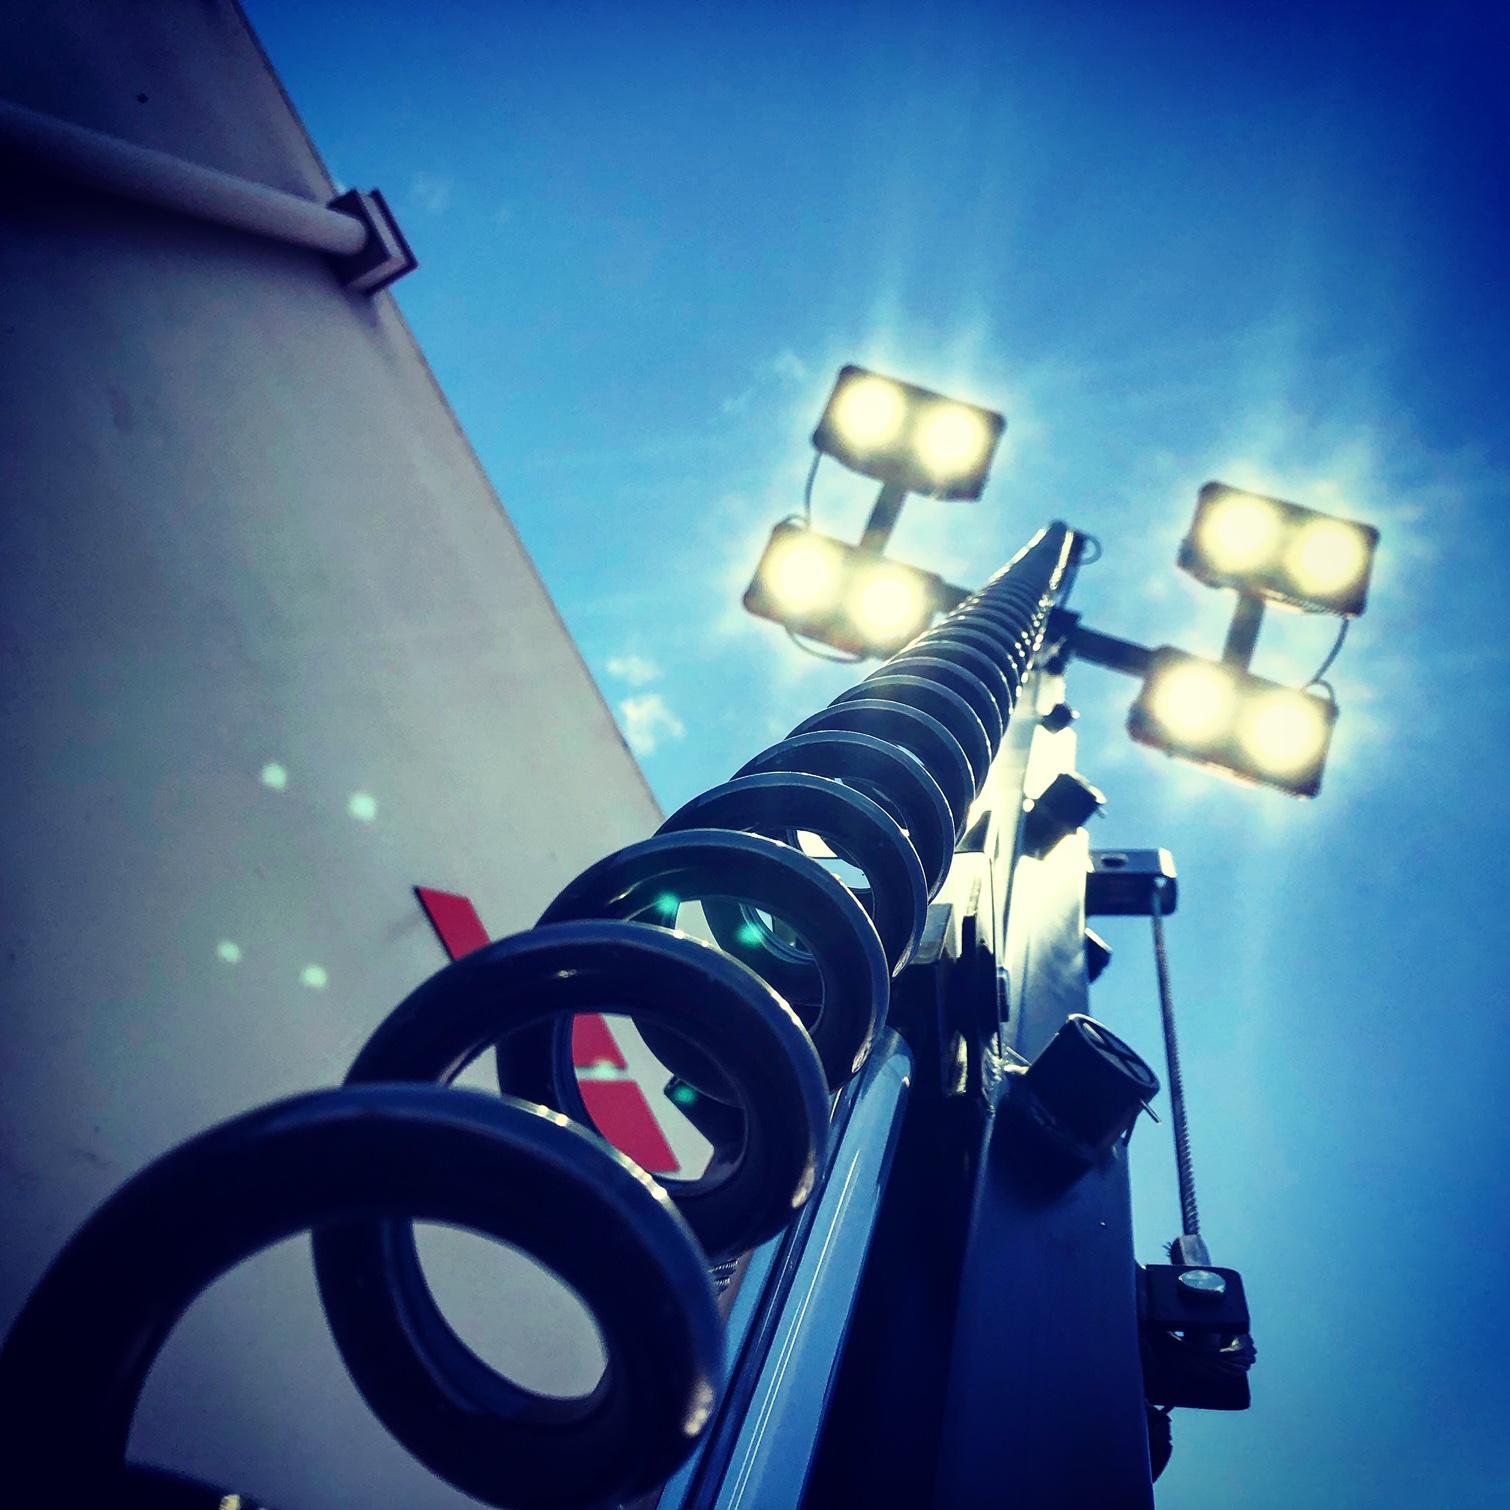 JLG Metroled Lighting Tower